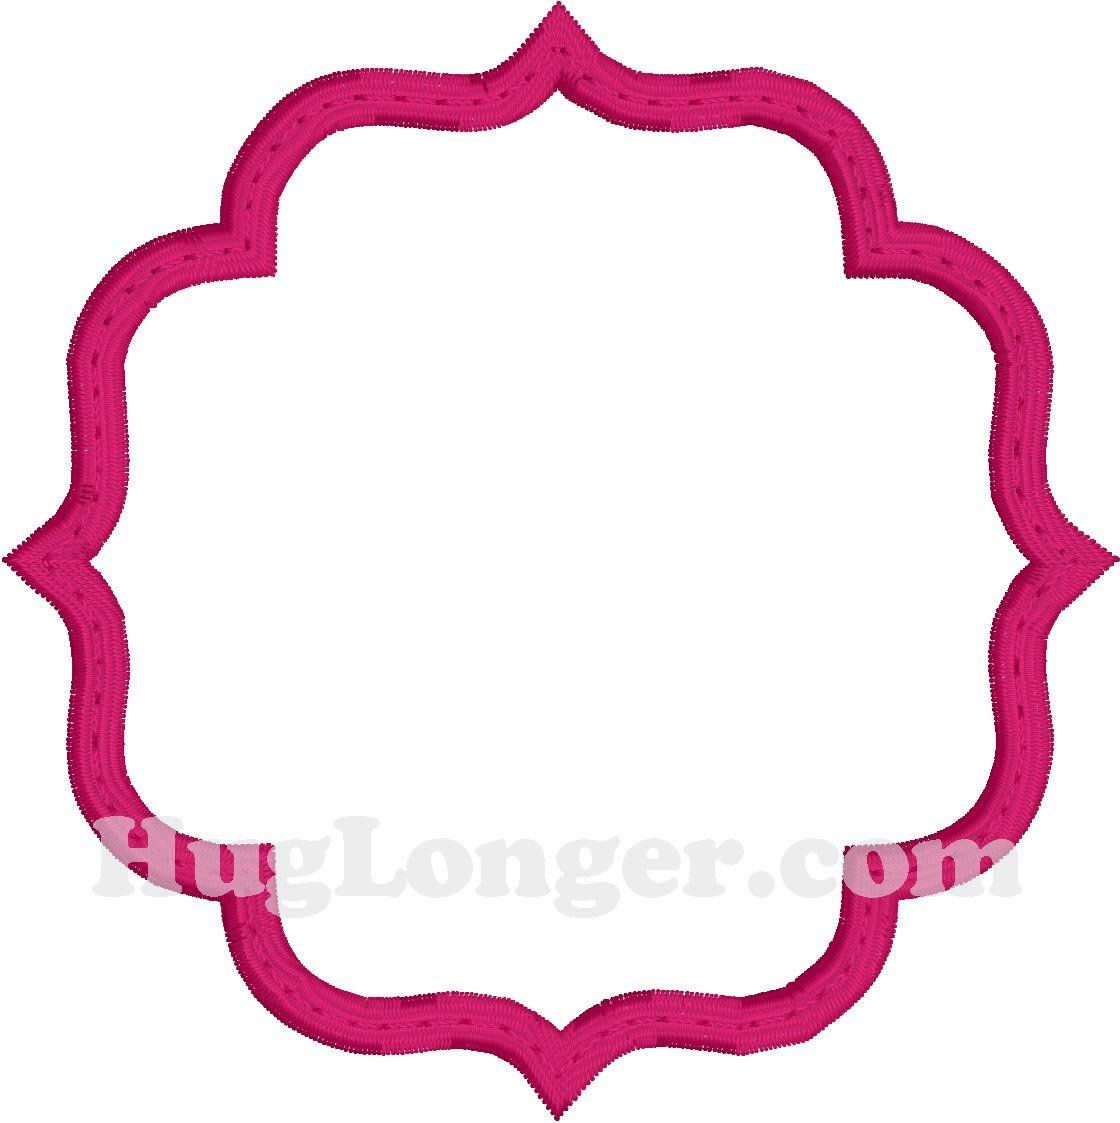 Applique Decorative Frame HL2197 embroidery file | machine ...